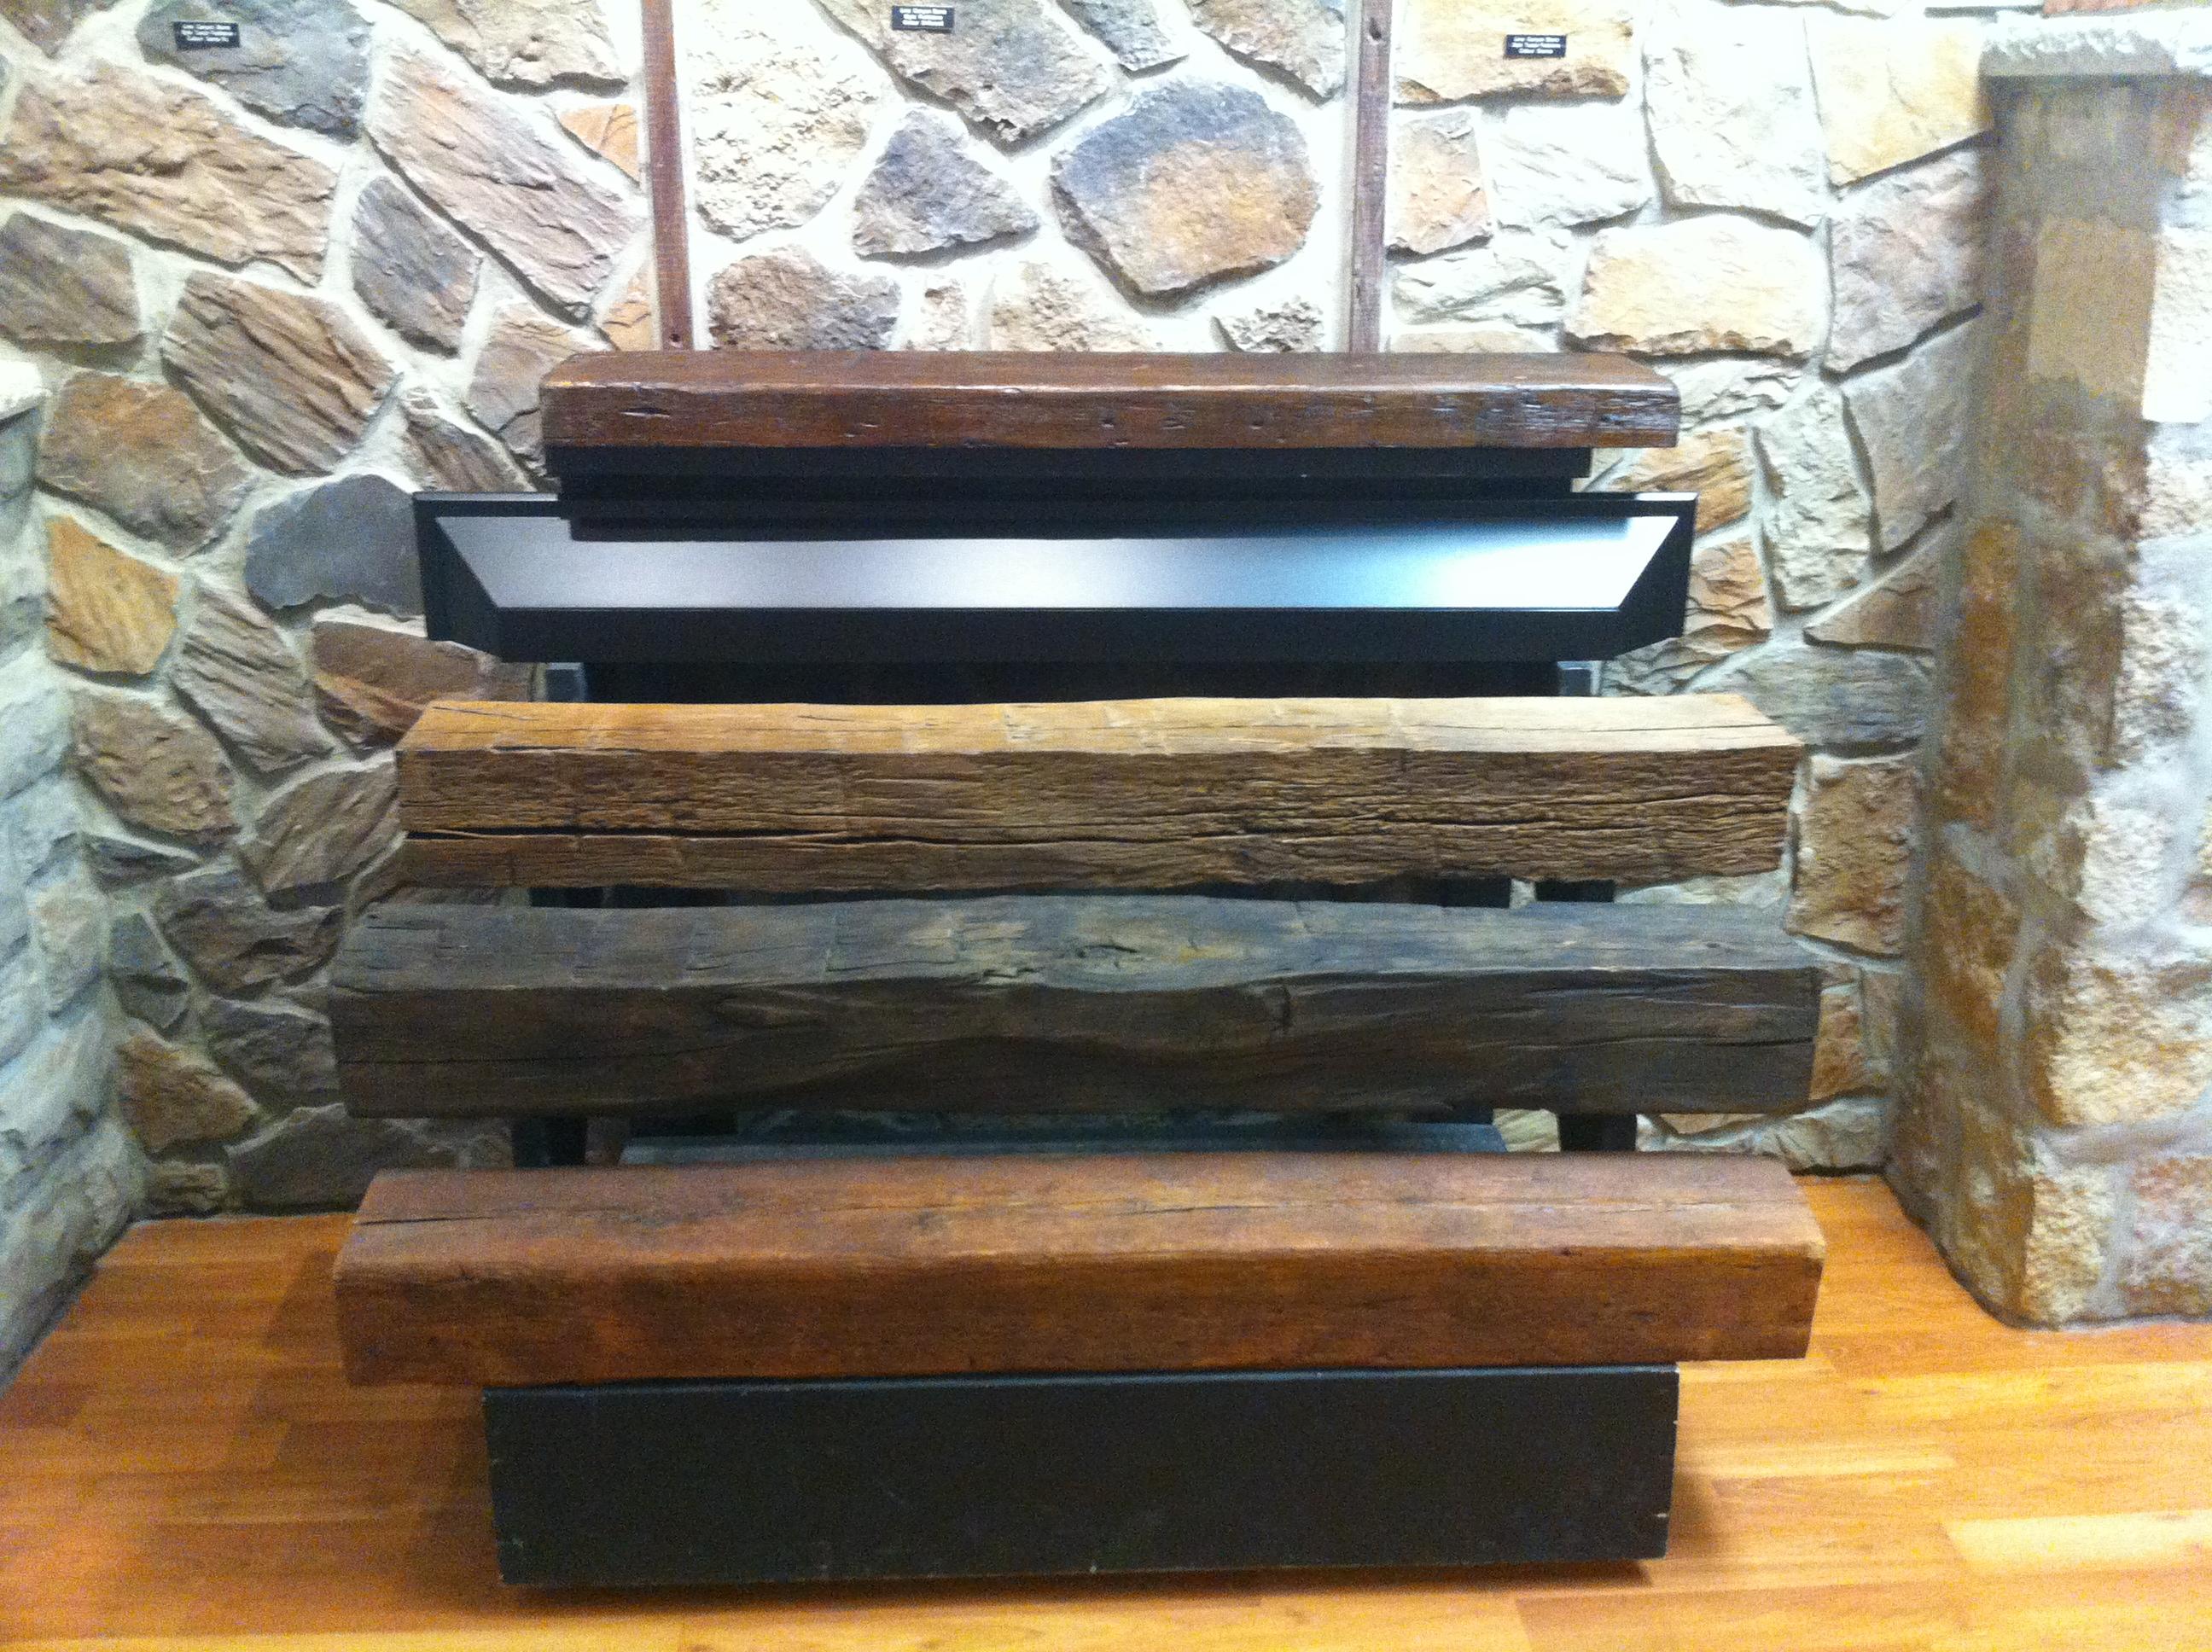 Ver chimeneas rusticas amazing chimeneas de madera - Ver chimeneas rusticas ...